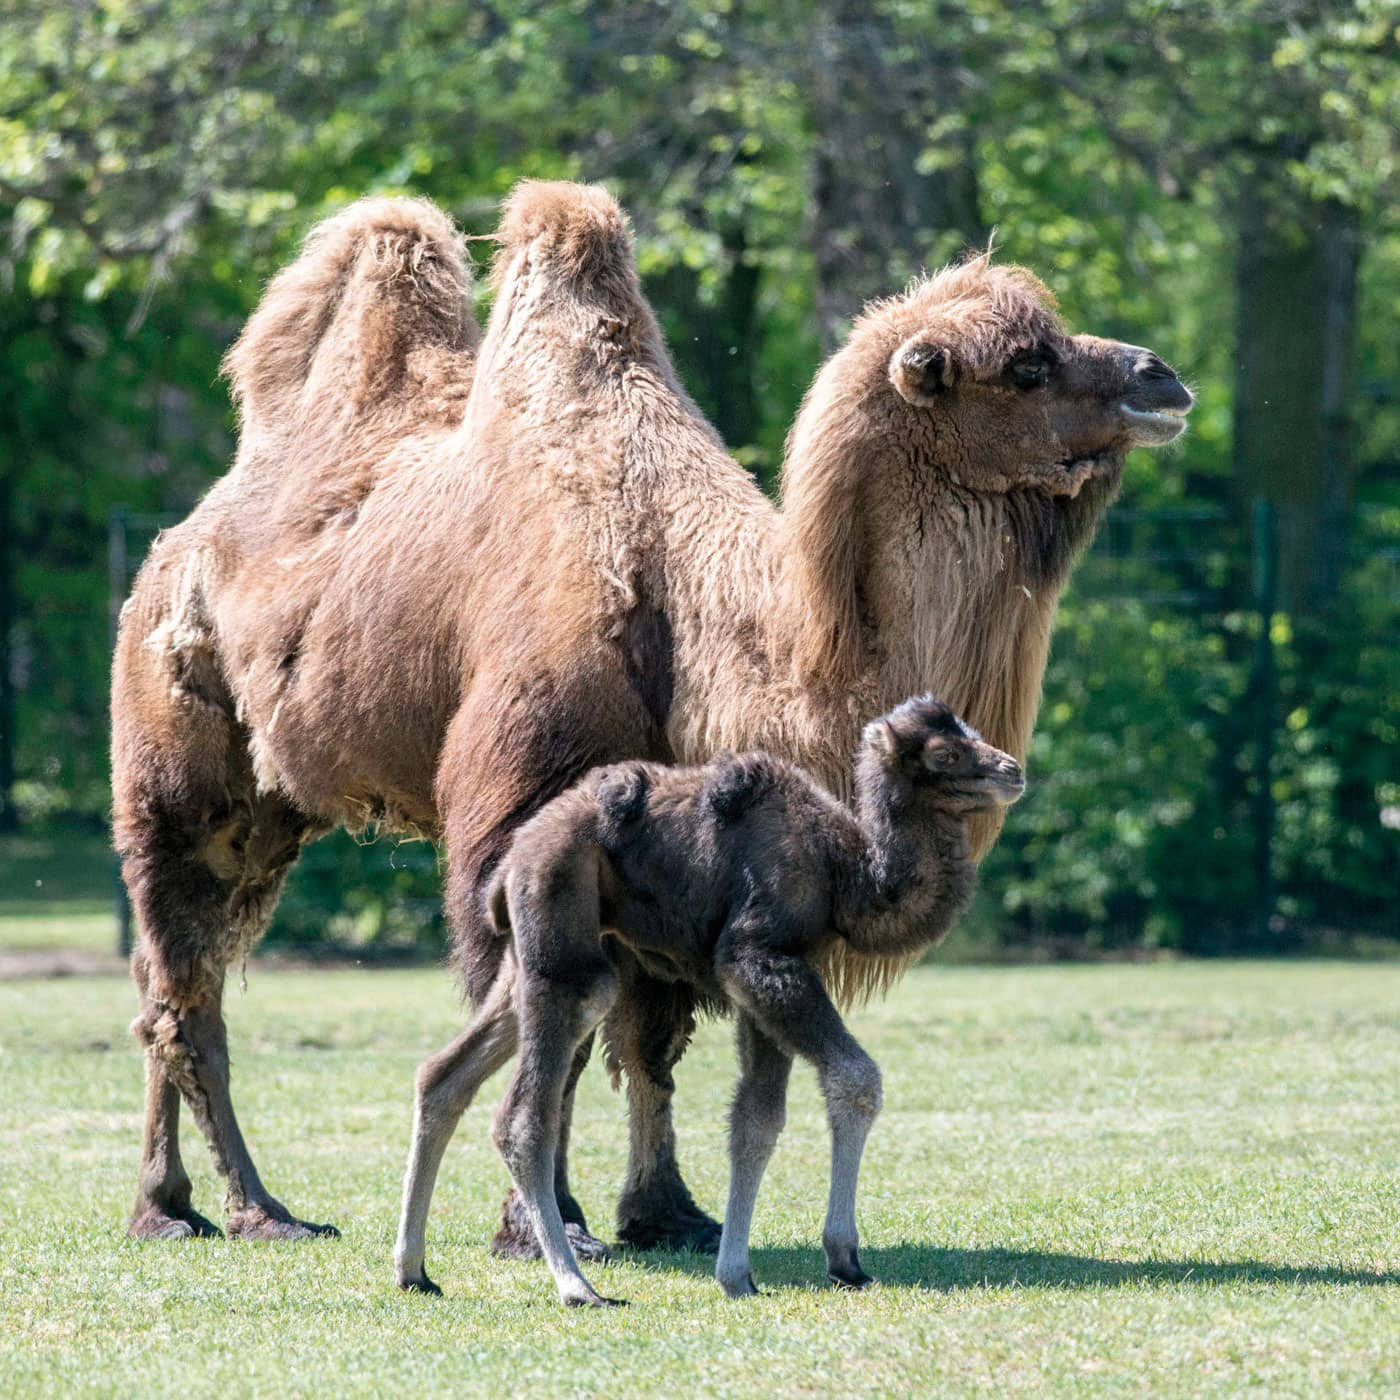 Ausflugstipps im Sommer: Tierpark Berlin //HIMBEER